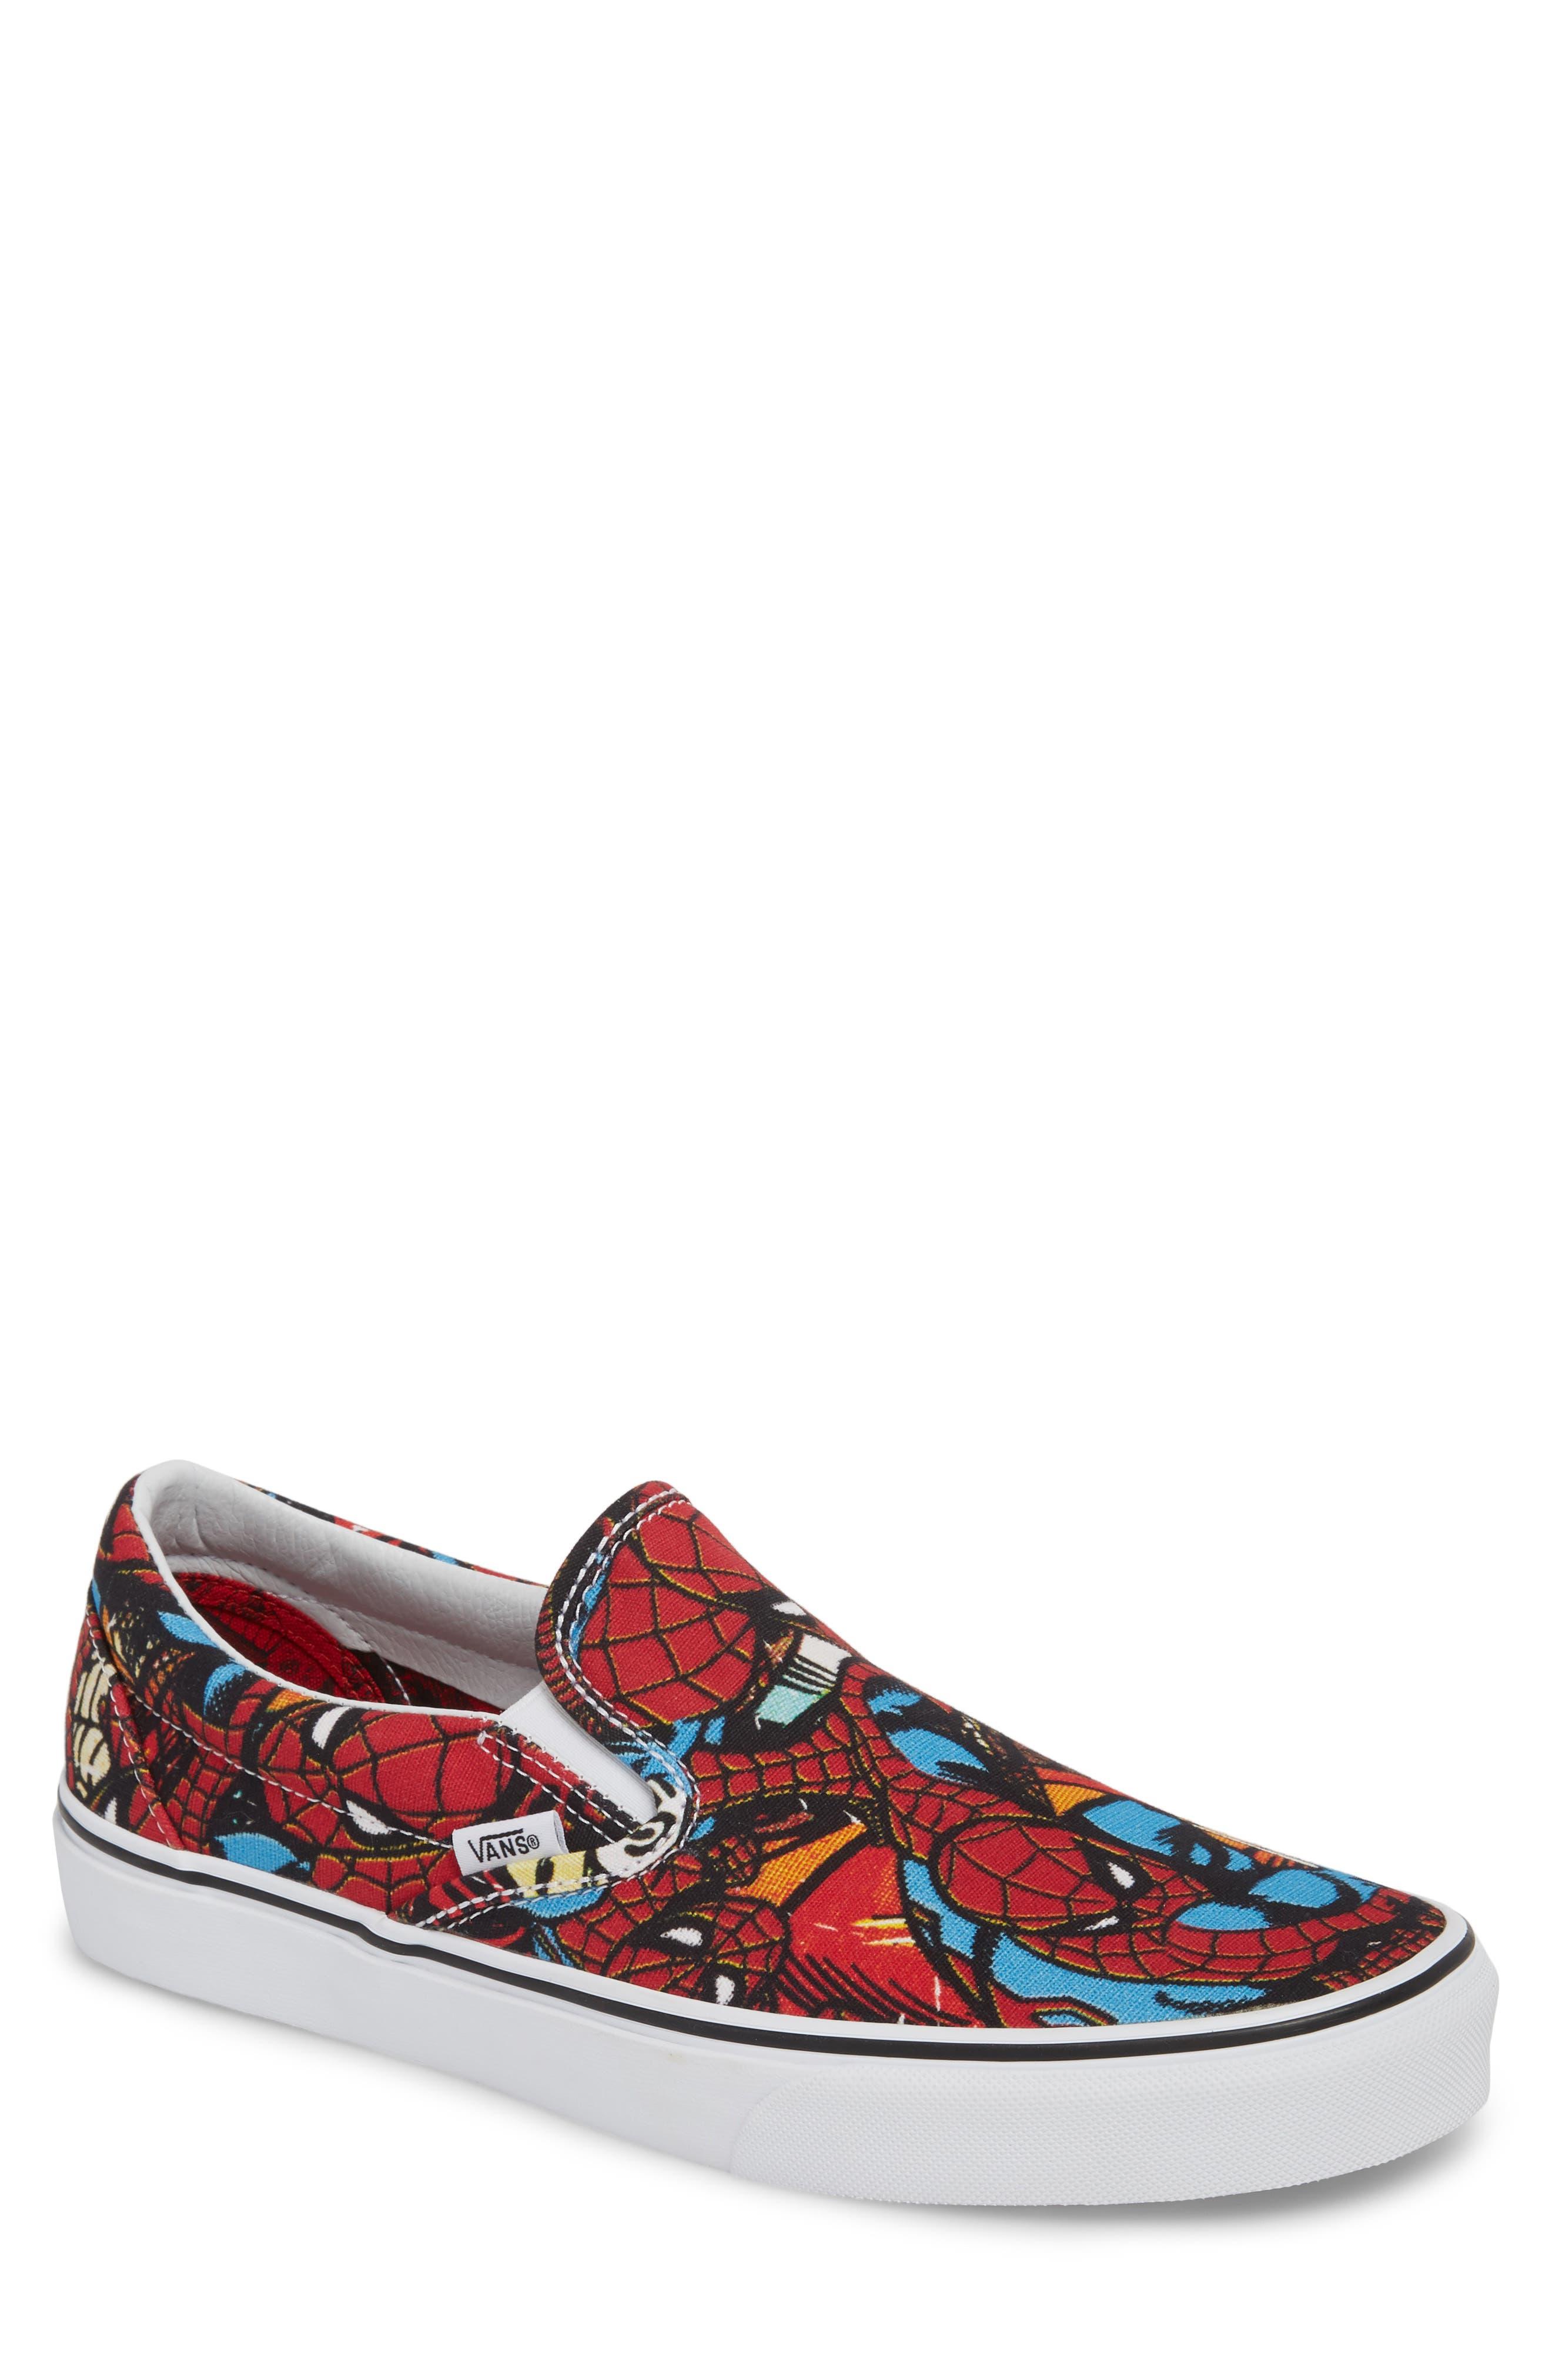 Marvel UA Classic Slip-On Sneaker,                             Main thumbnail 1, color,                             Black/ Red Textile